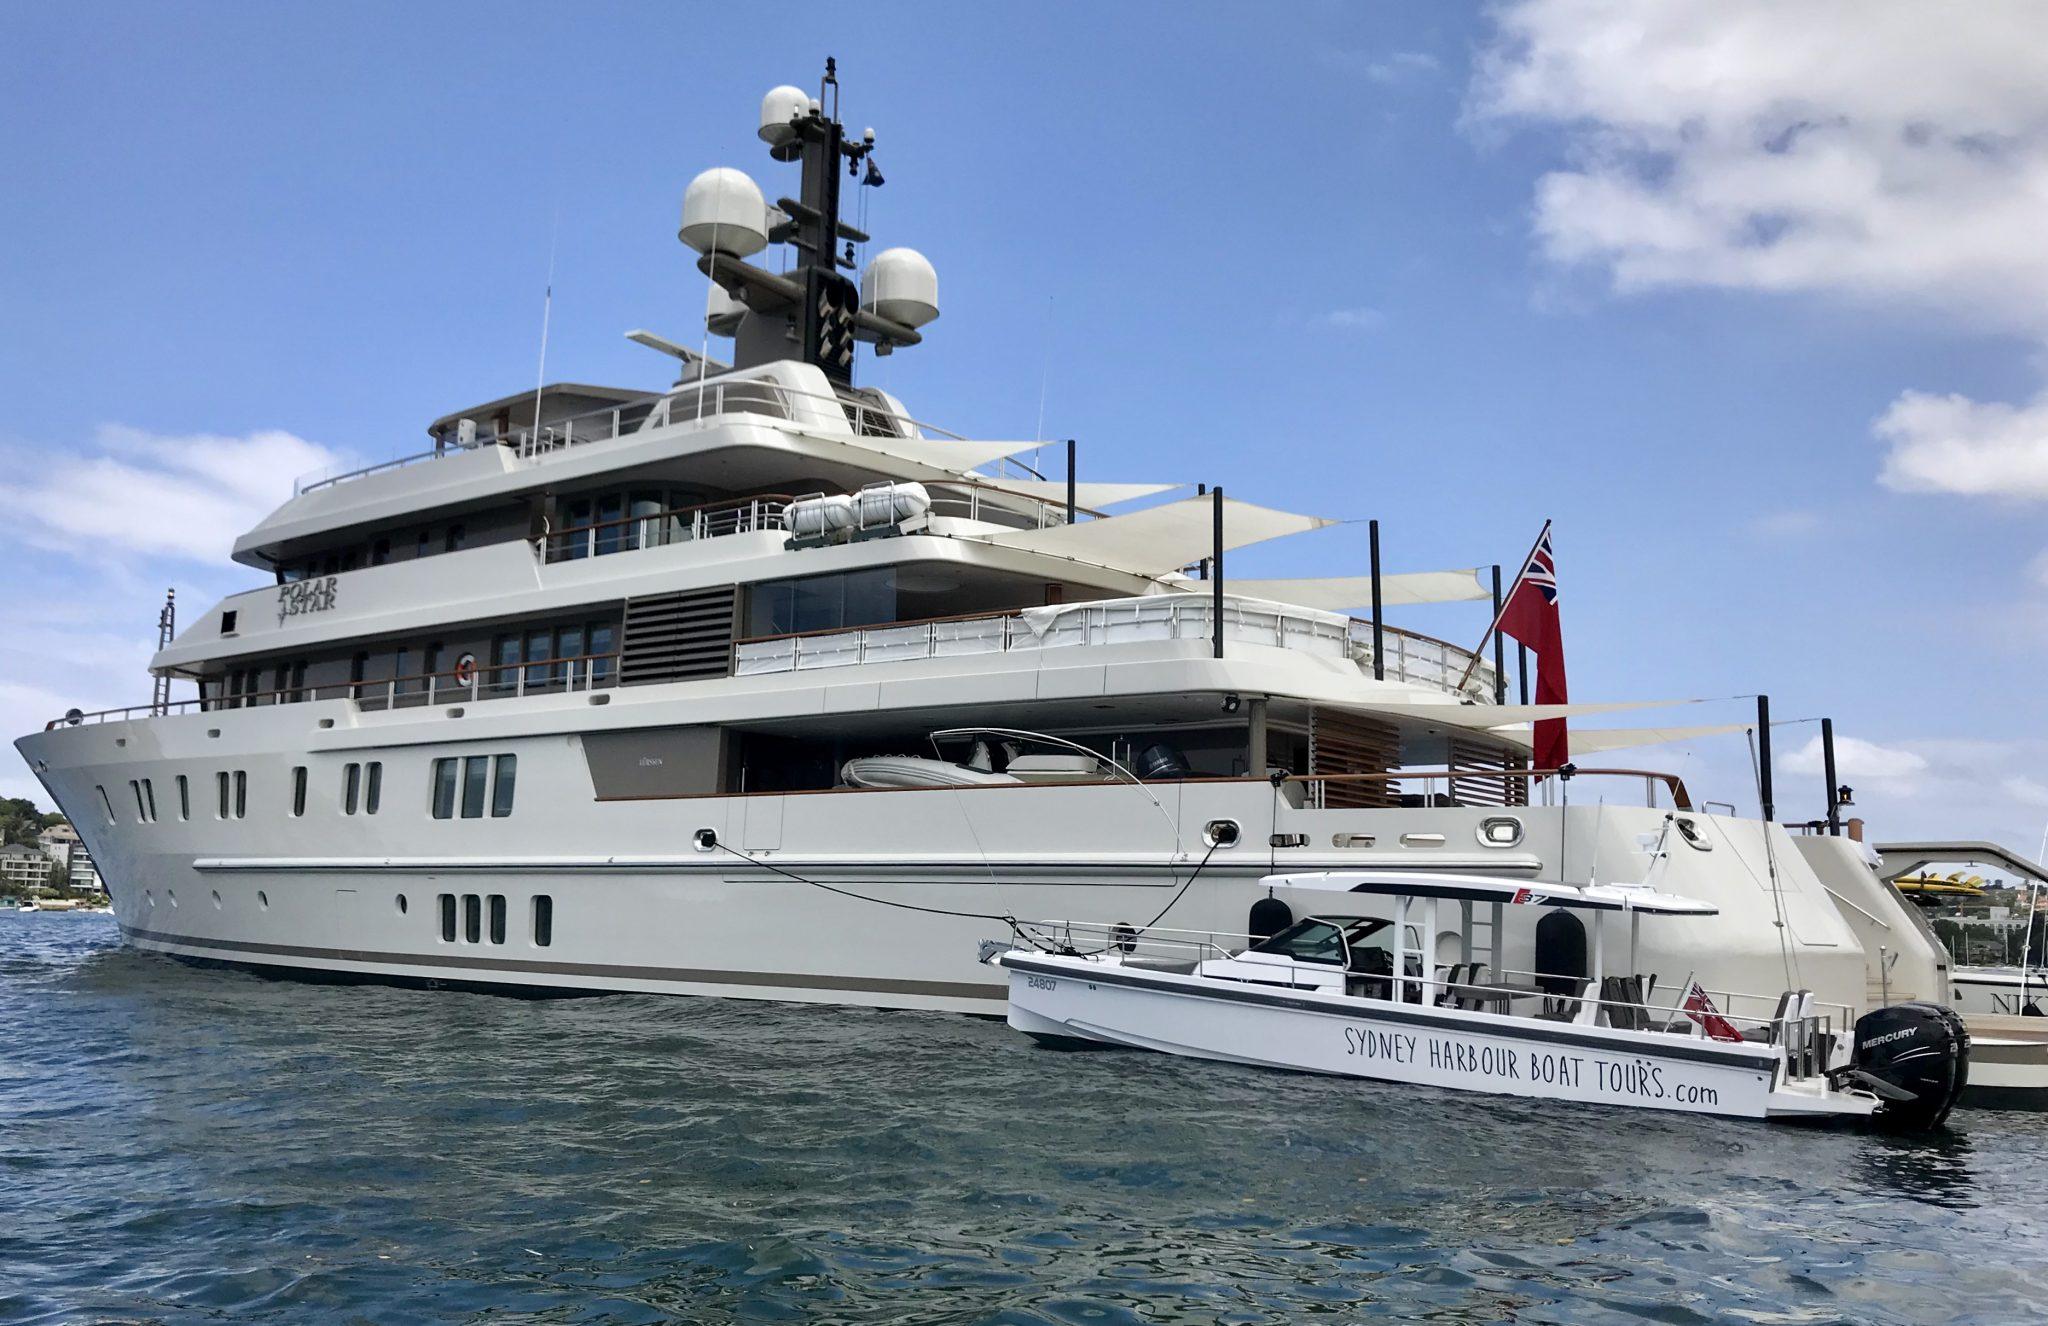 Sydney Harbour Boat Tours | Tender super yacht